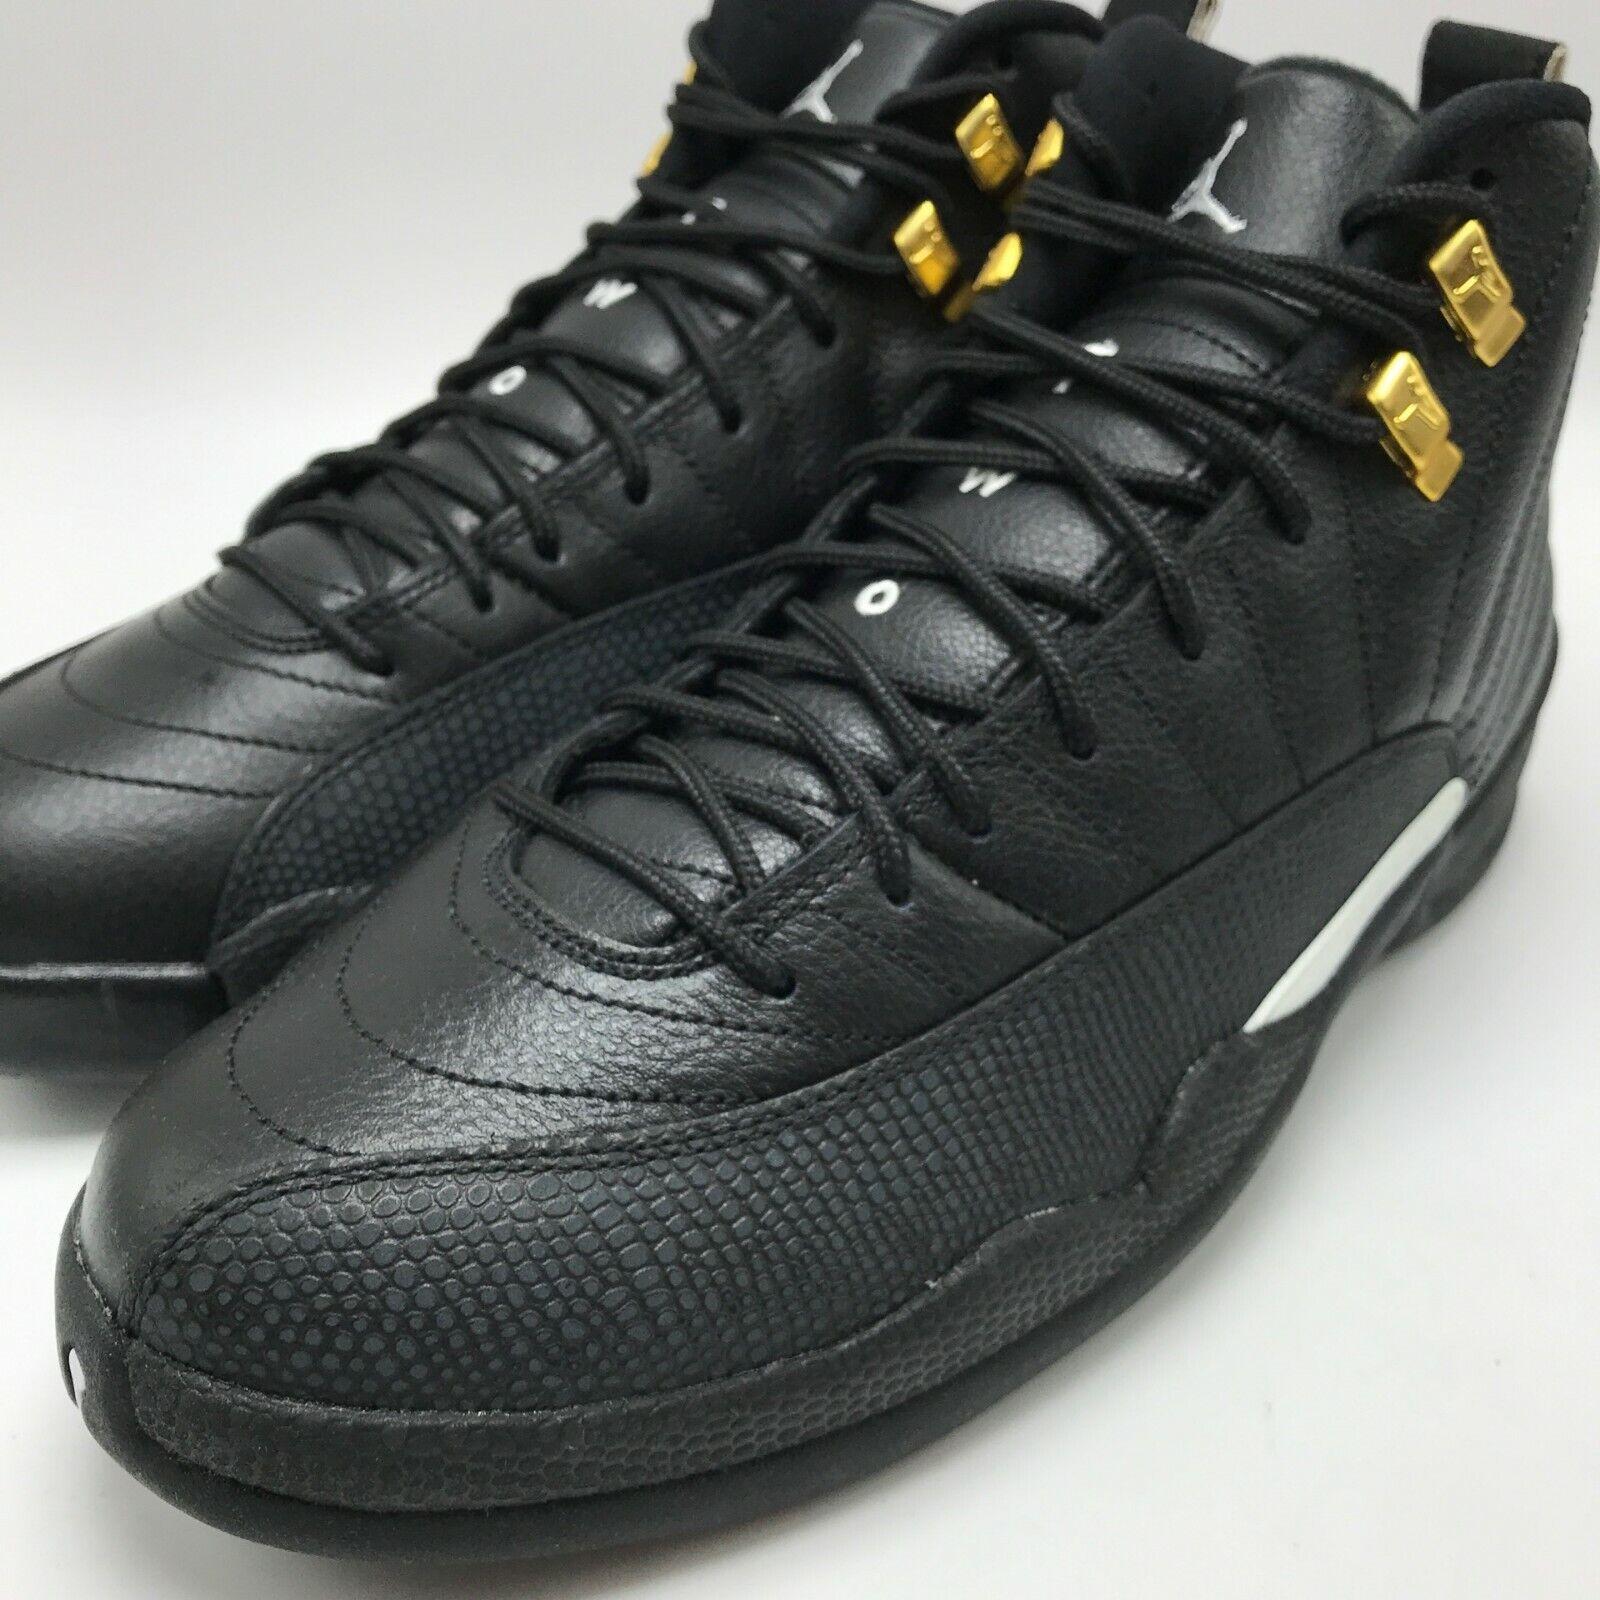 womens Air jordan 12 Nike Air Jordan 12 Retro Men's Basketball Shoes Black/White-Black ...